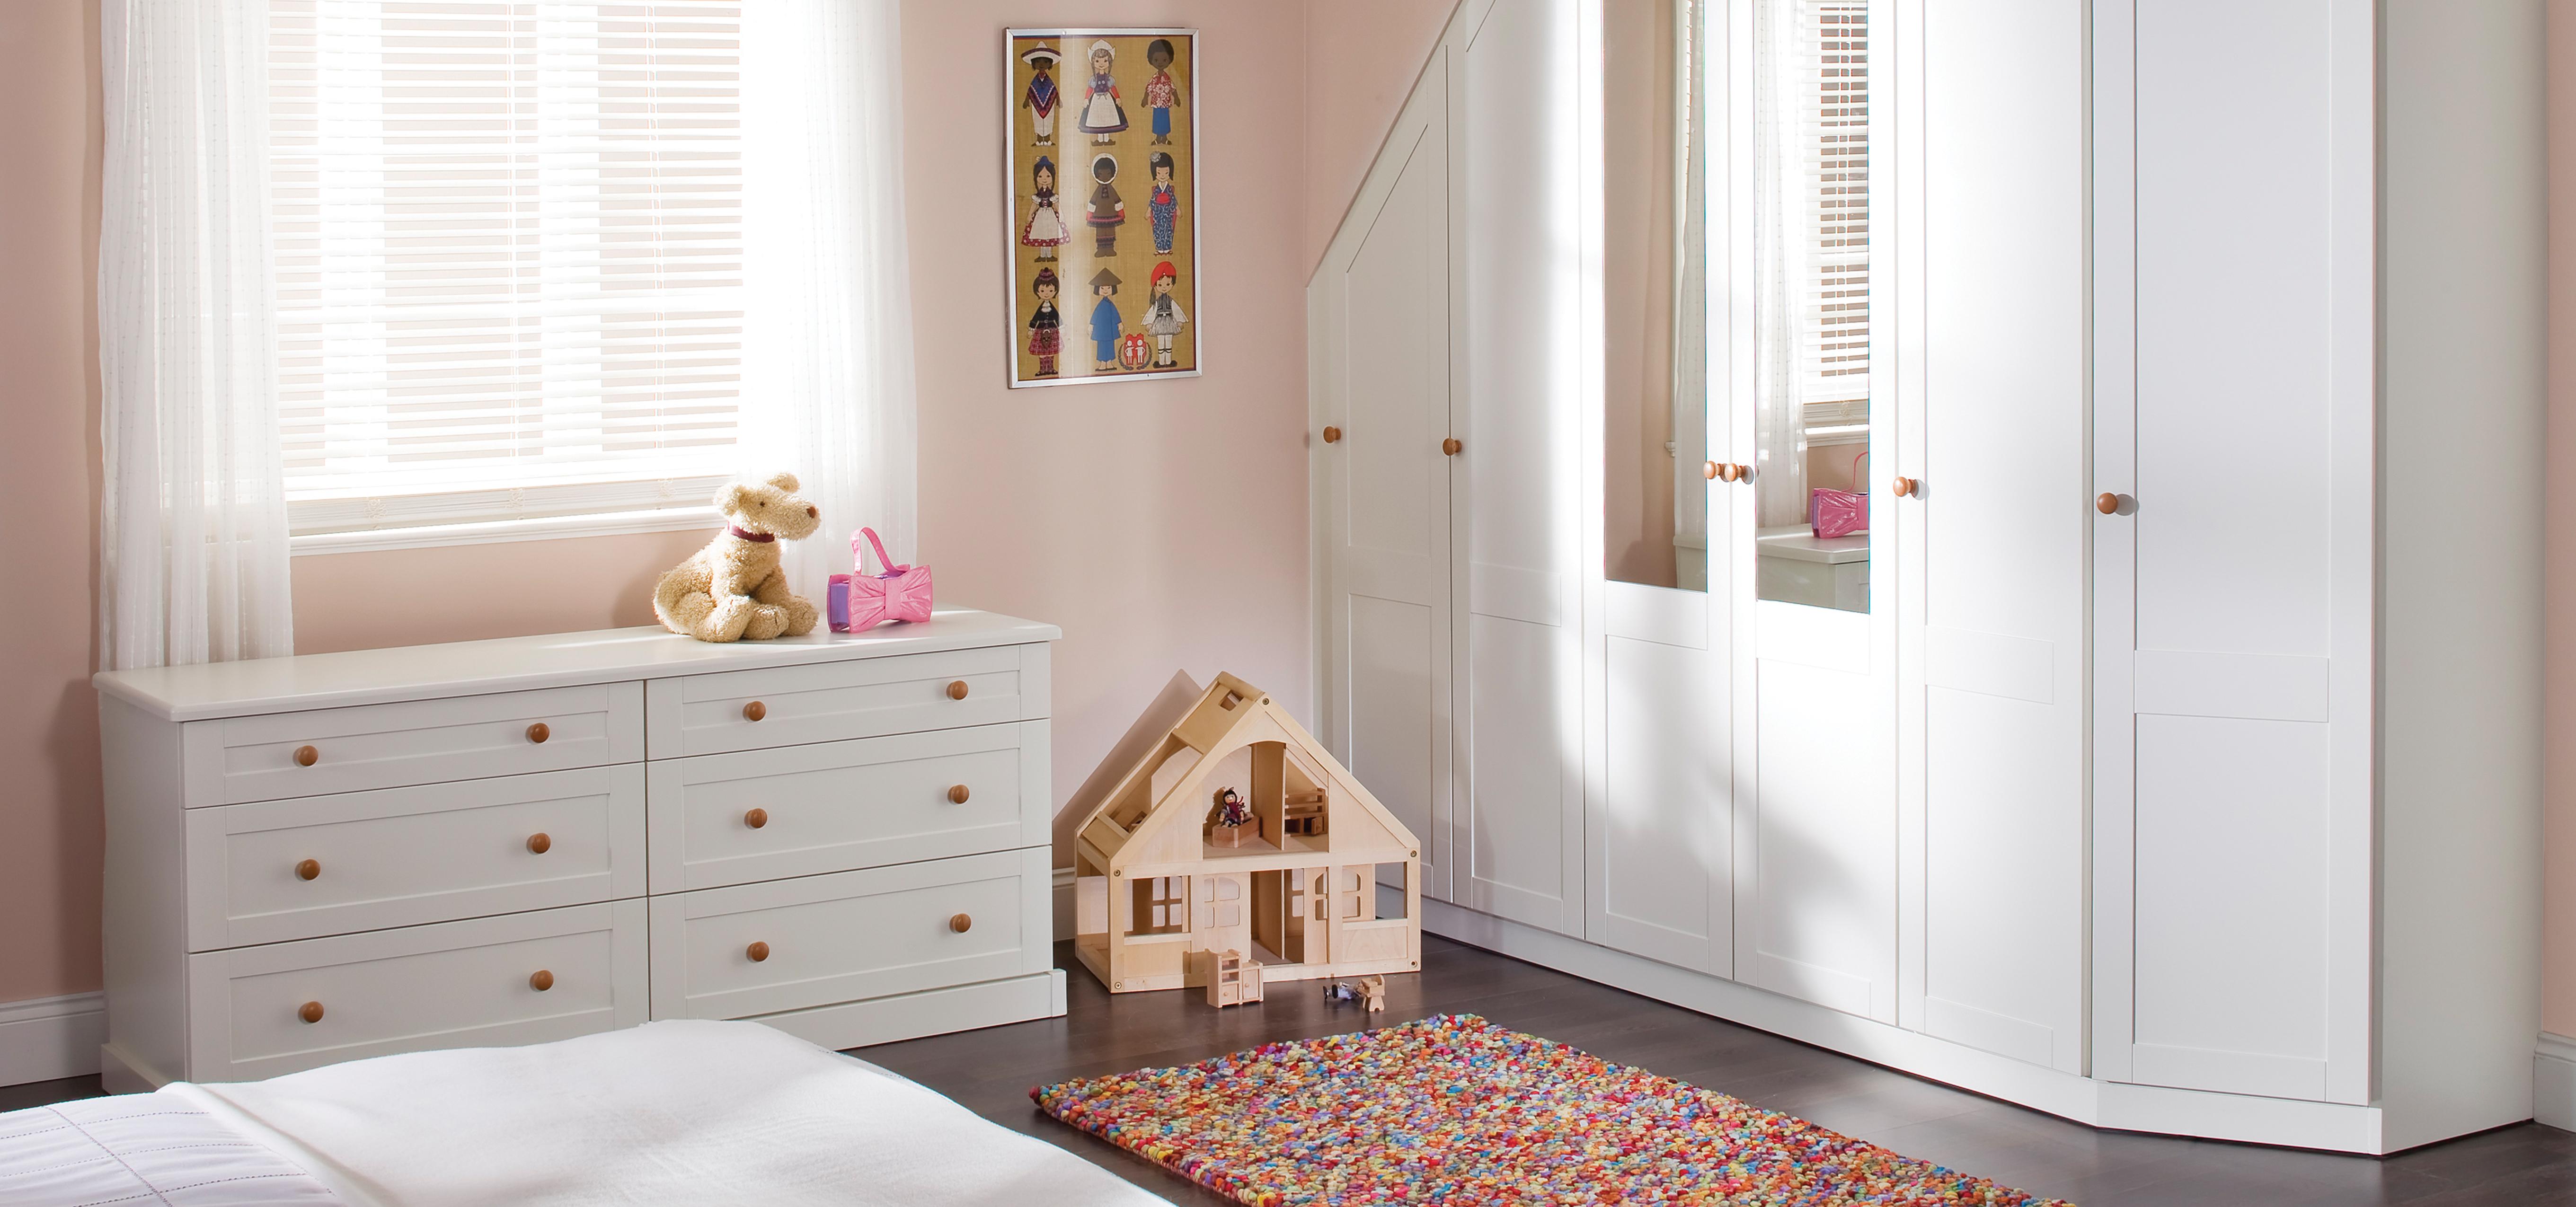 Children's room Shaker style bedroom